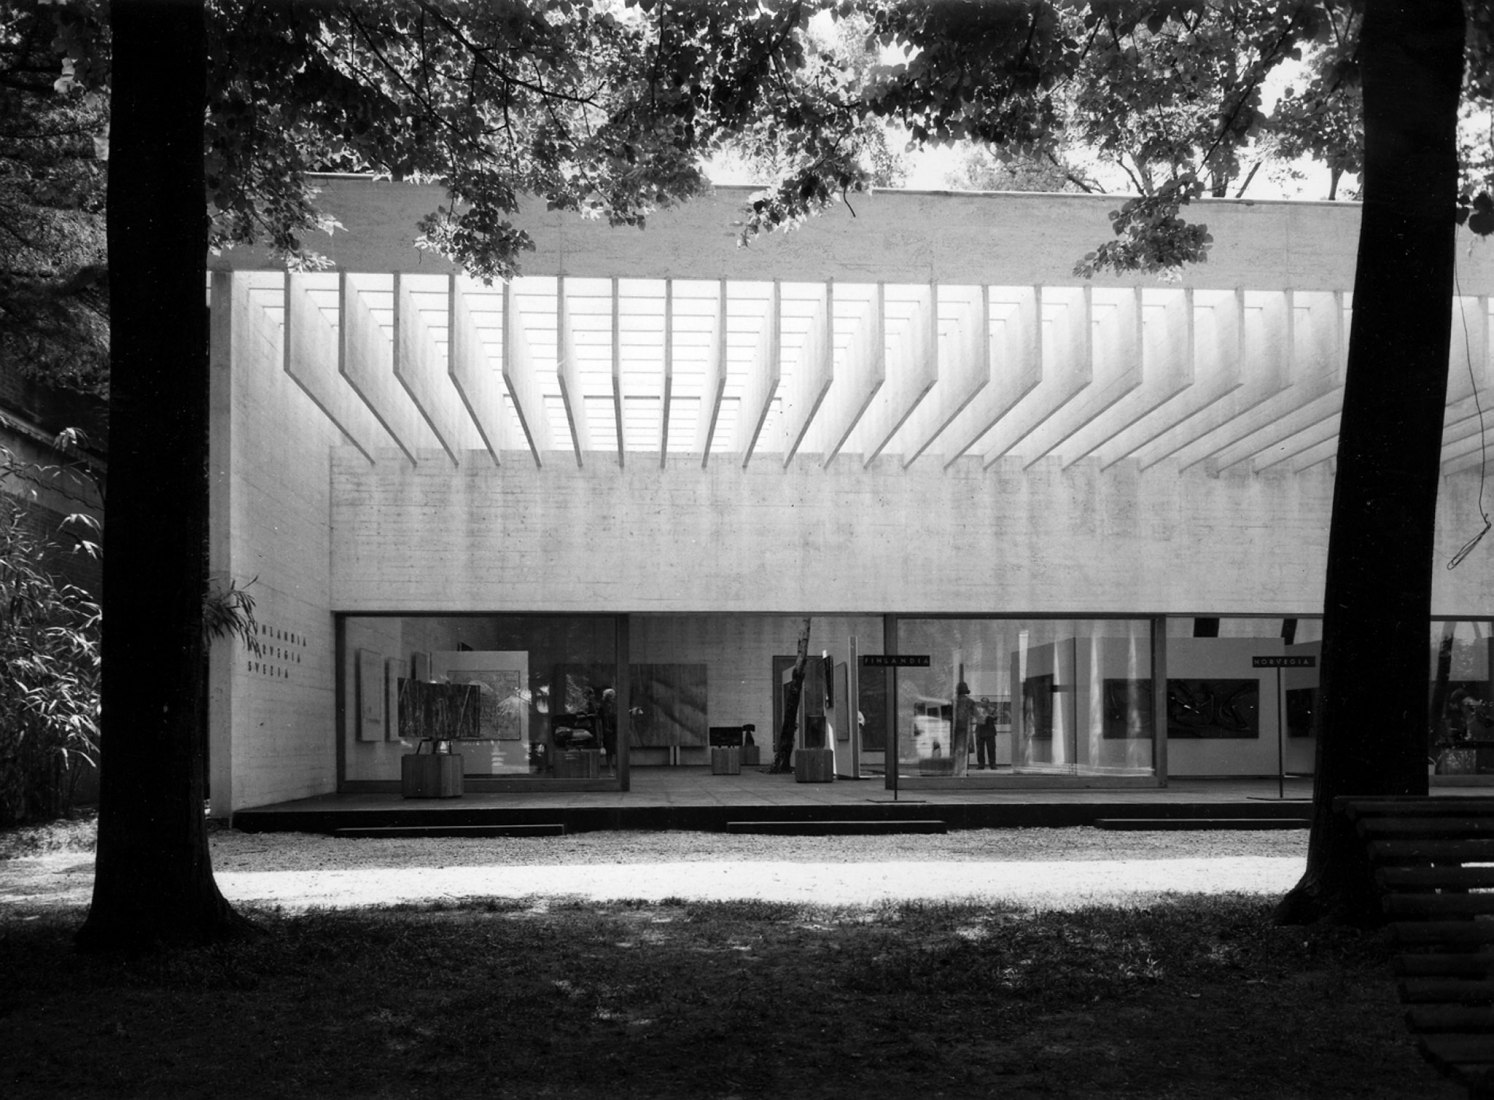 Nordic Pavilion, Venice. Photograph by Ferruzzi. Courtesy of Nasjonalmuseet